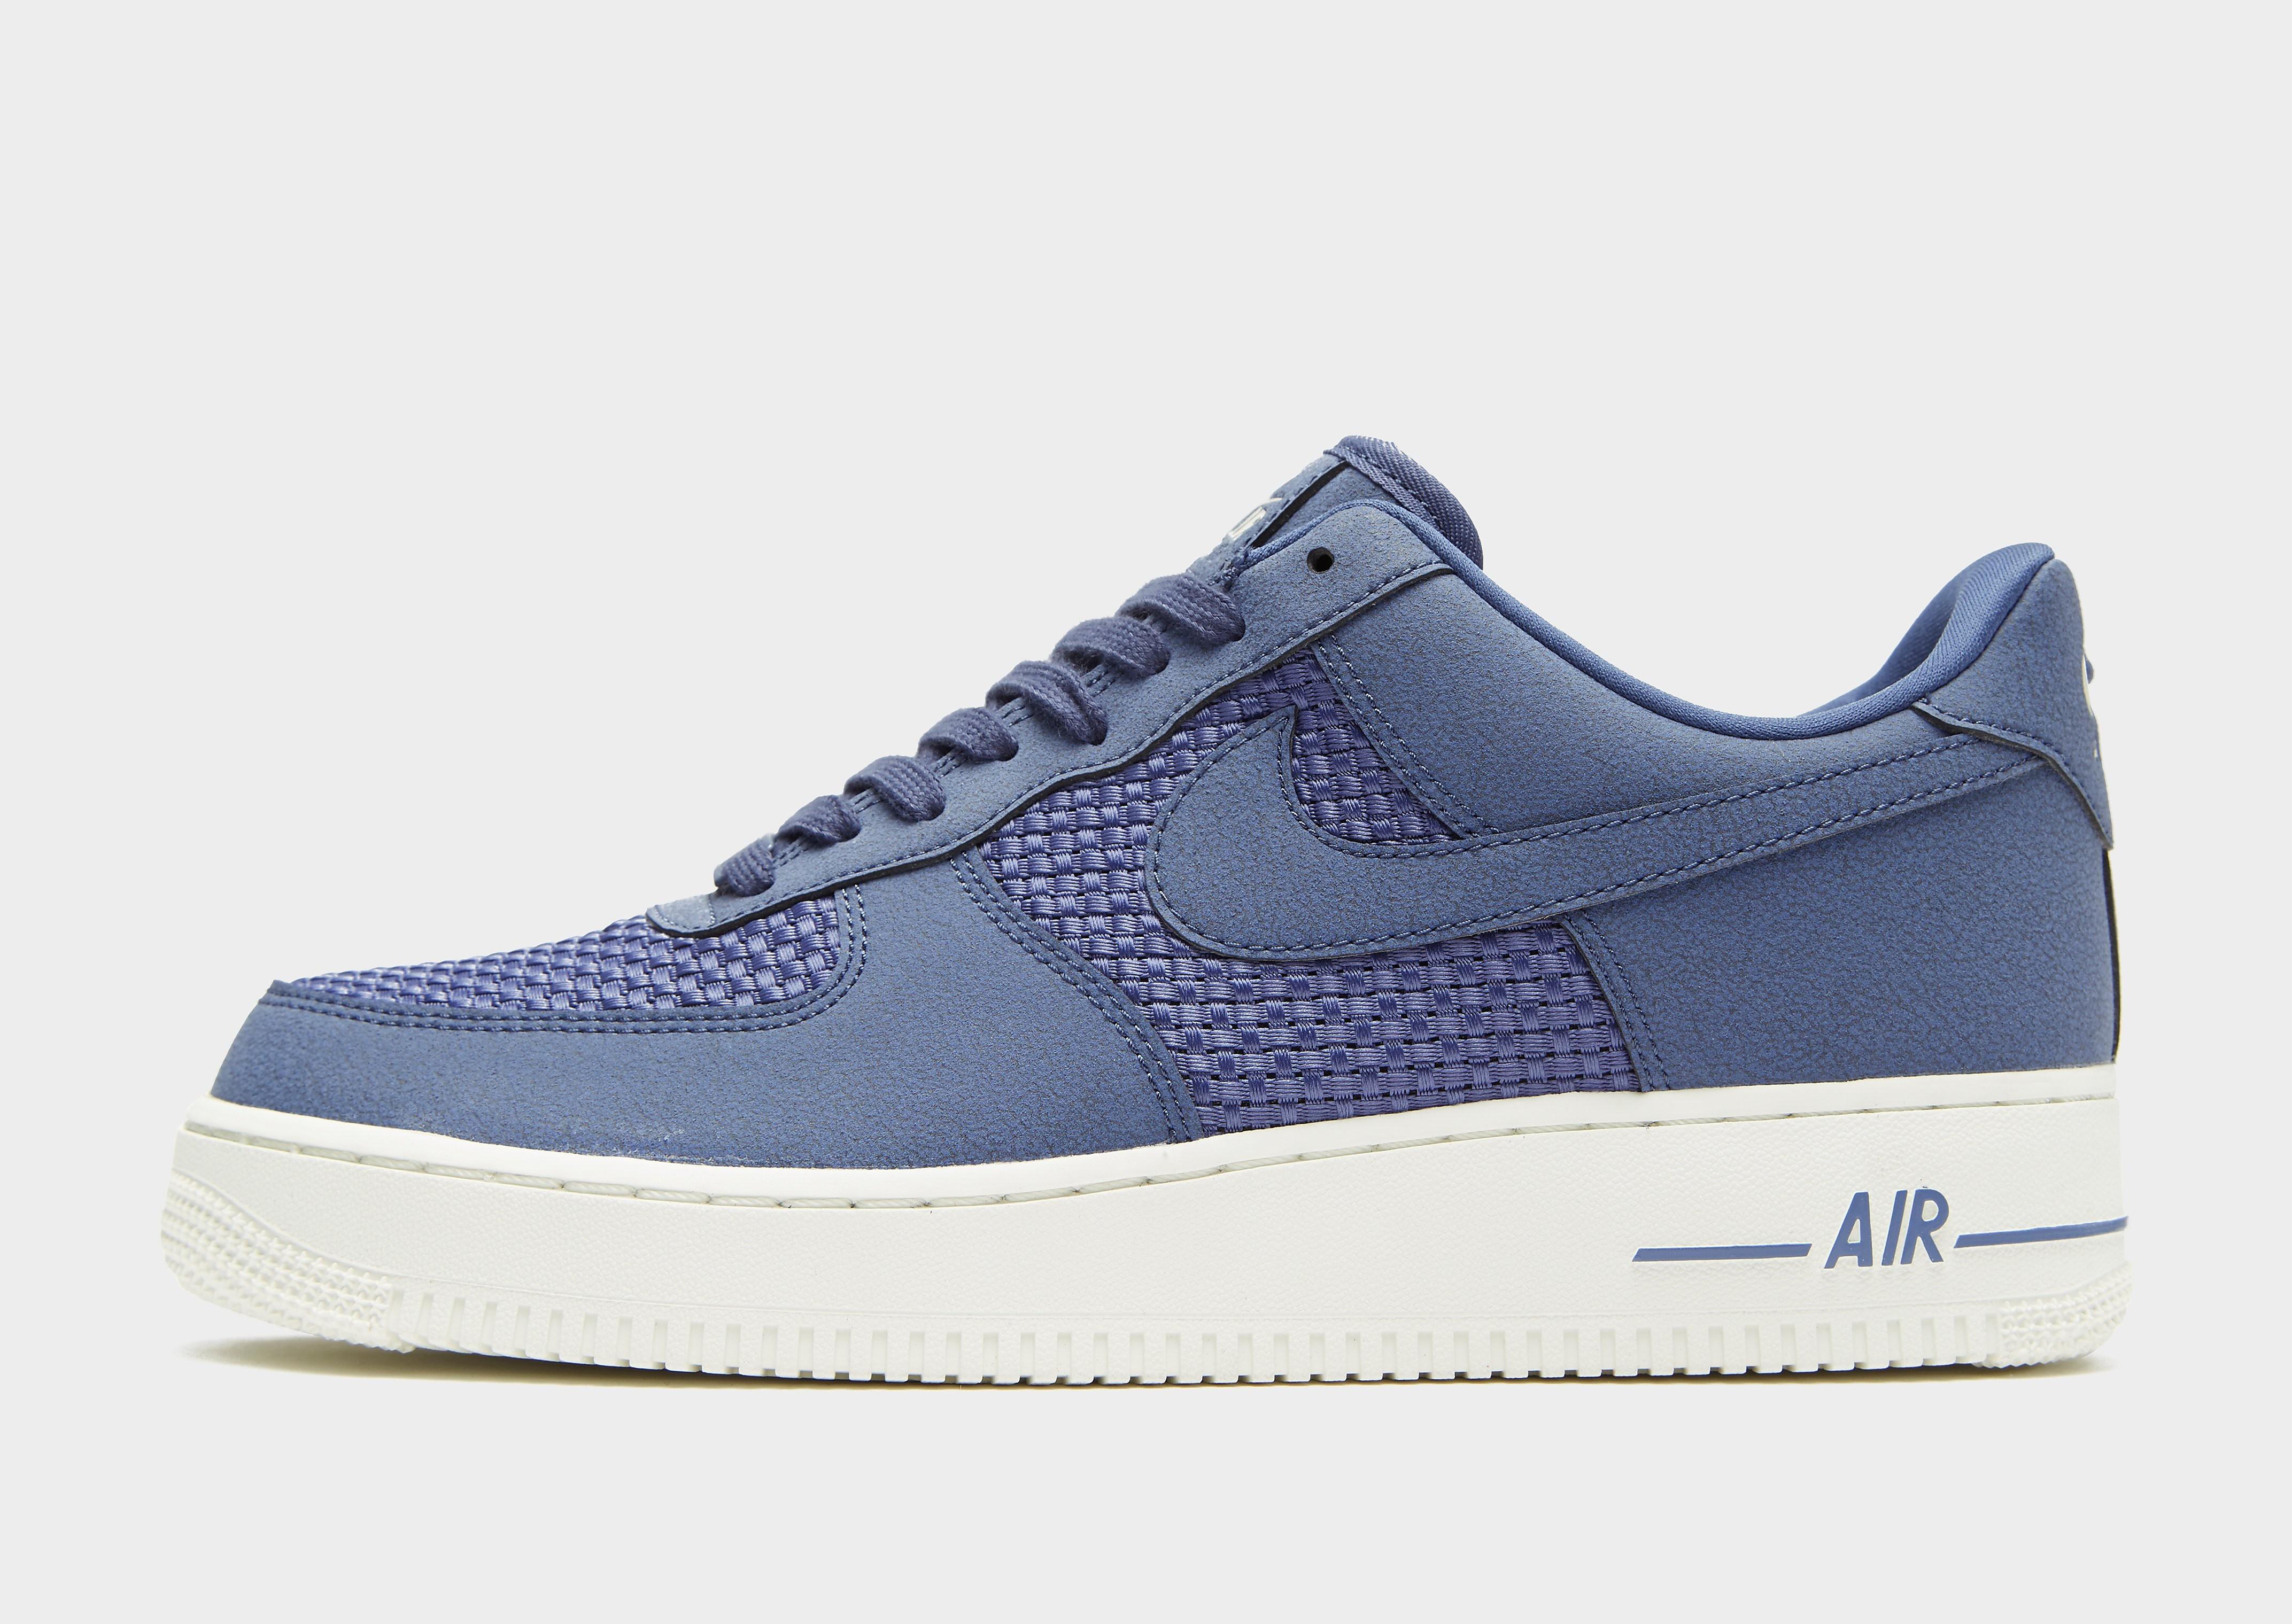 Nike Air Force 1 Low Miehet